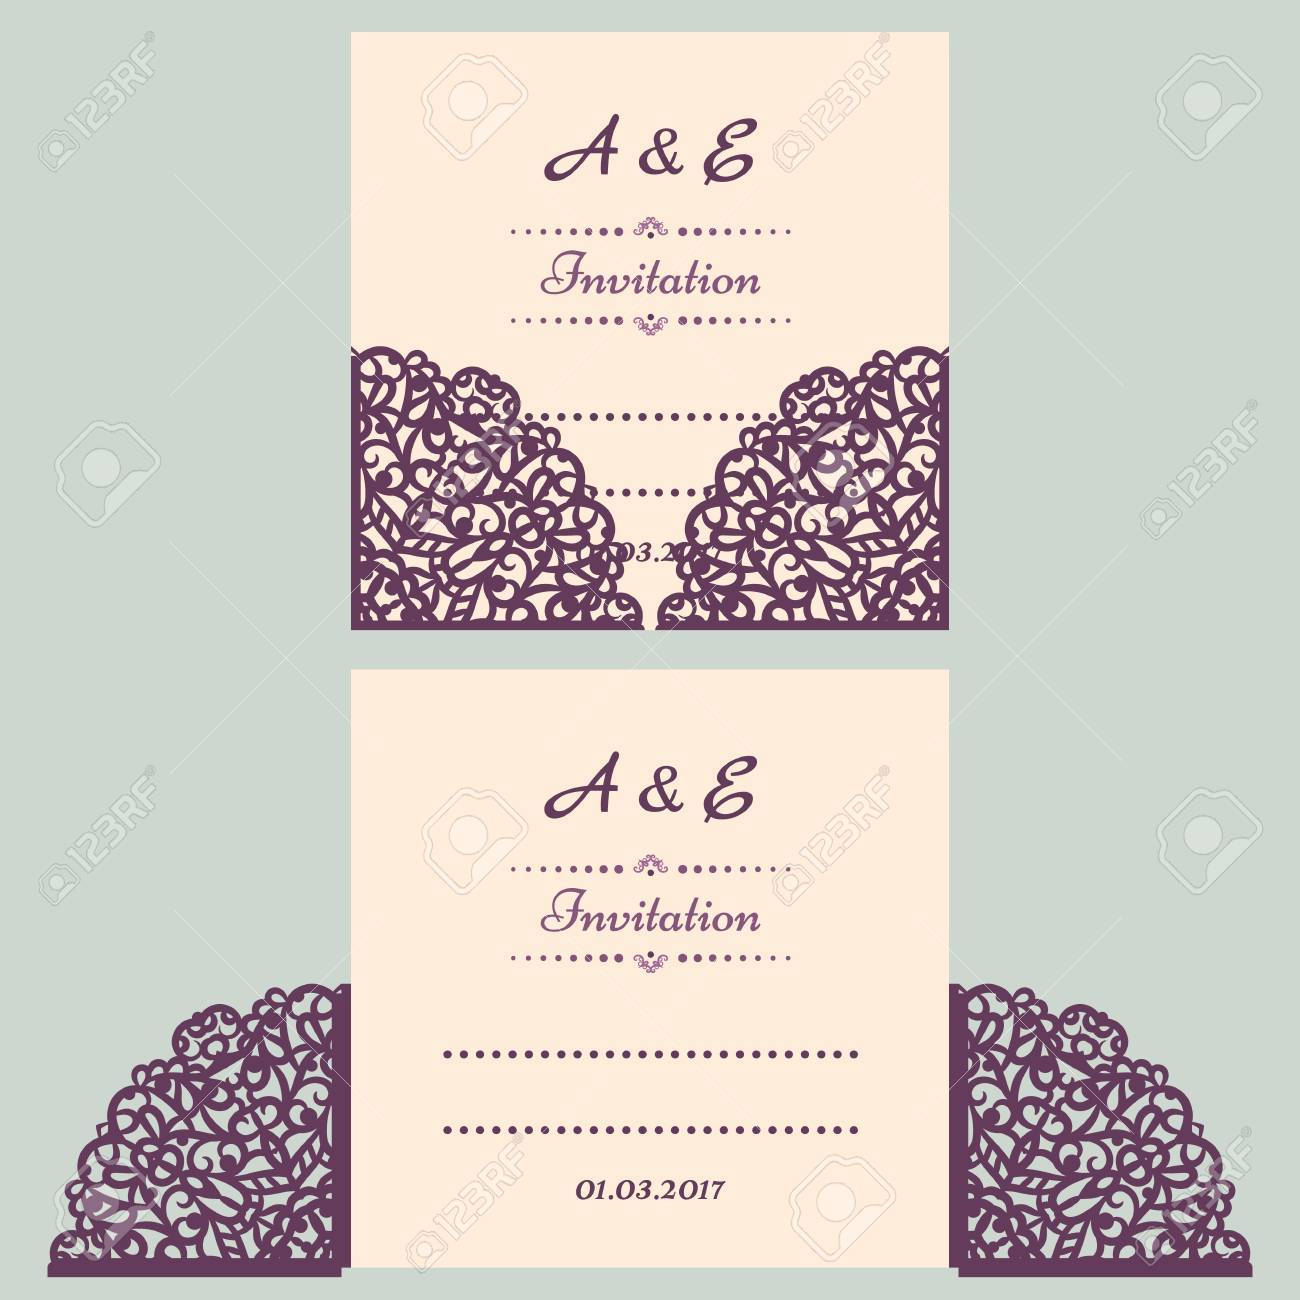 Lazercut vector wedding invitation template wedding invitation lazercut vector wedding invitation template wedding invitation envelope for laser cutting lace gate folds stopboris Gallery